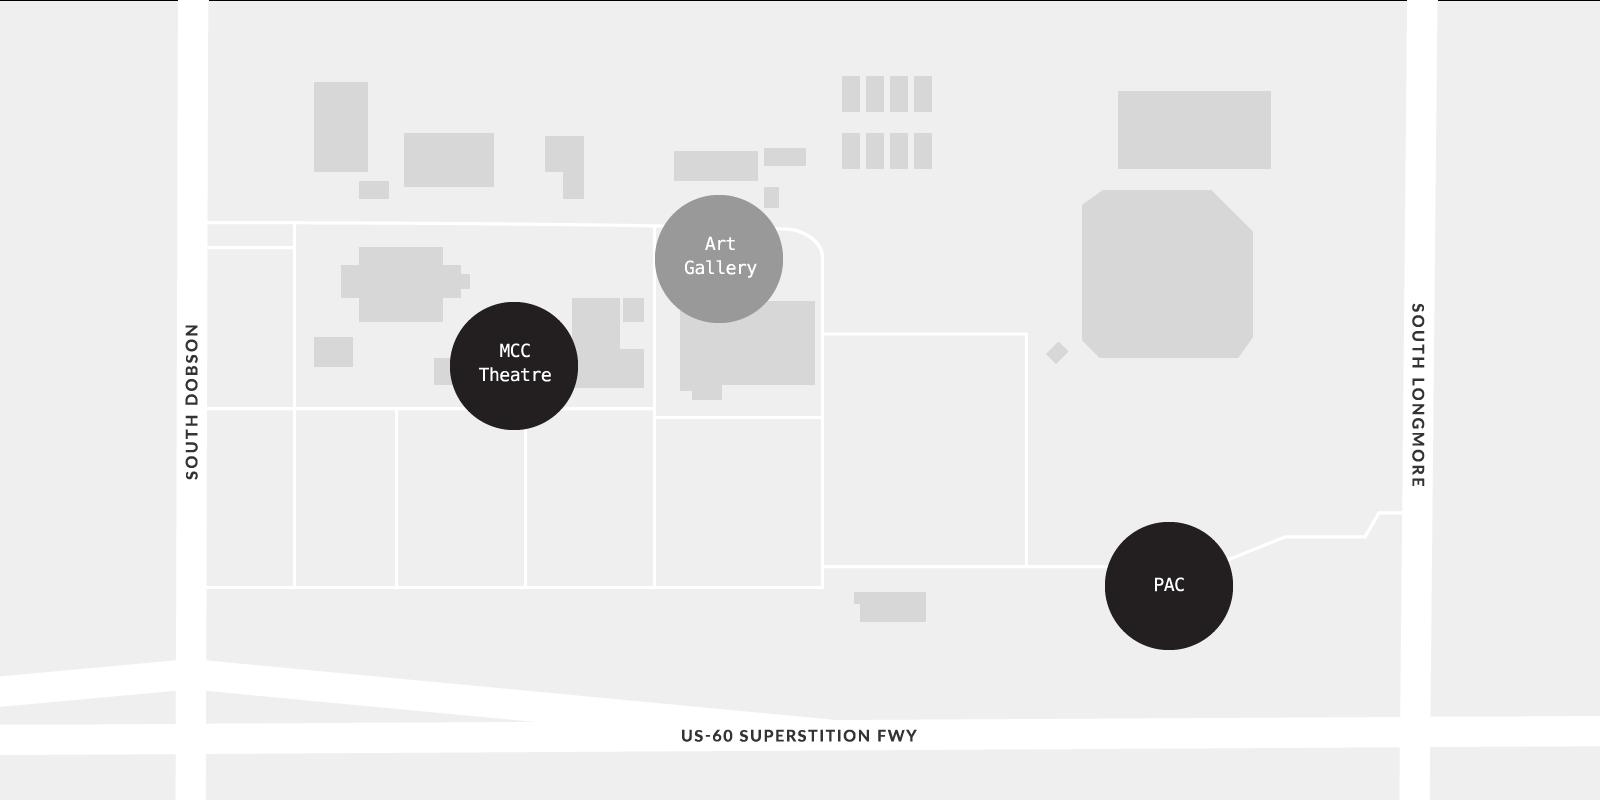 Art Gallery The Arts At Mcc Black Box Stage Diagram Theater Feiderdesign